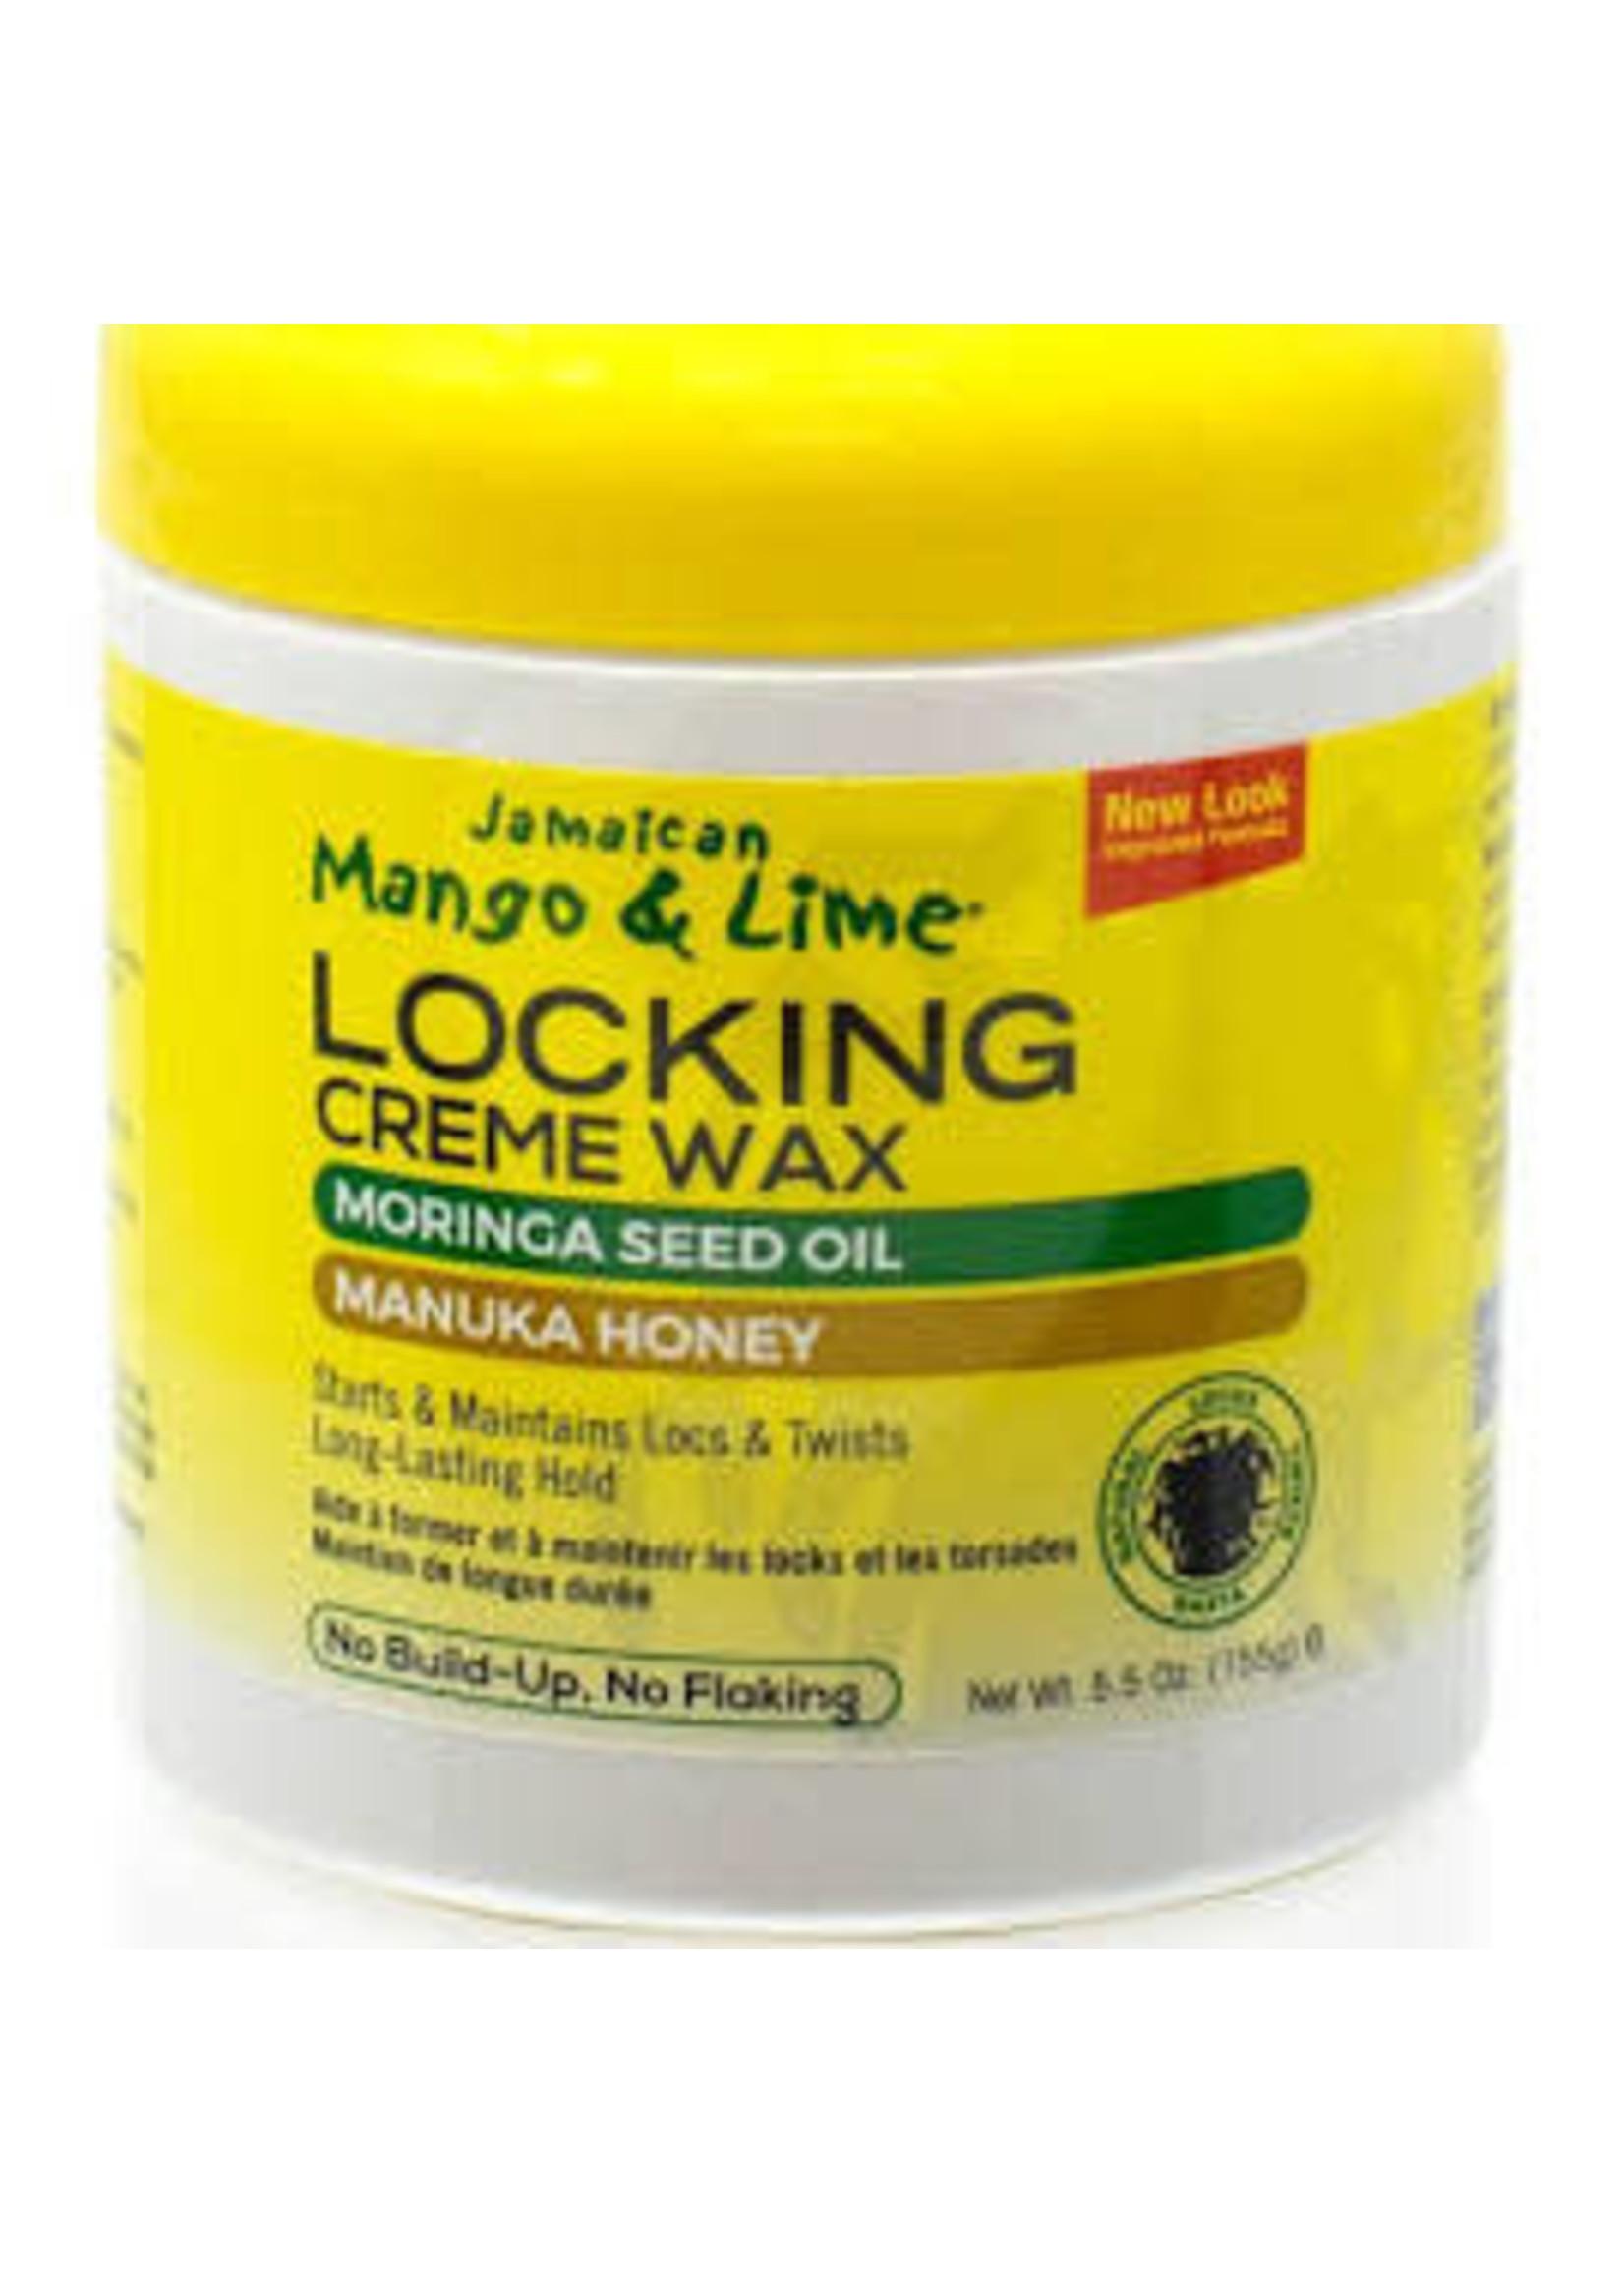 Jamaican Mango Lime Locking Creme Wax Moringa Seed Oil & Manuka Honey 5.5oz